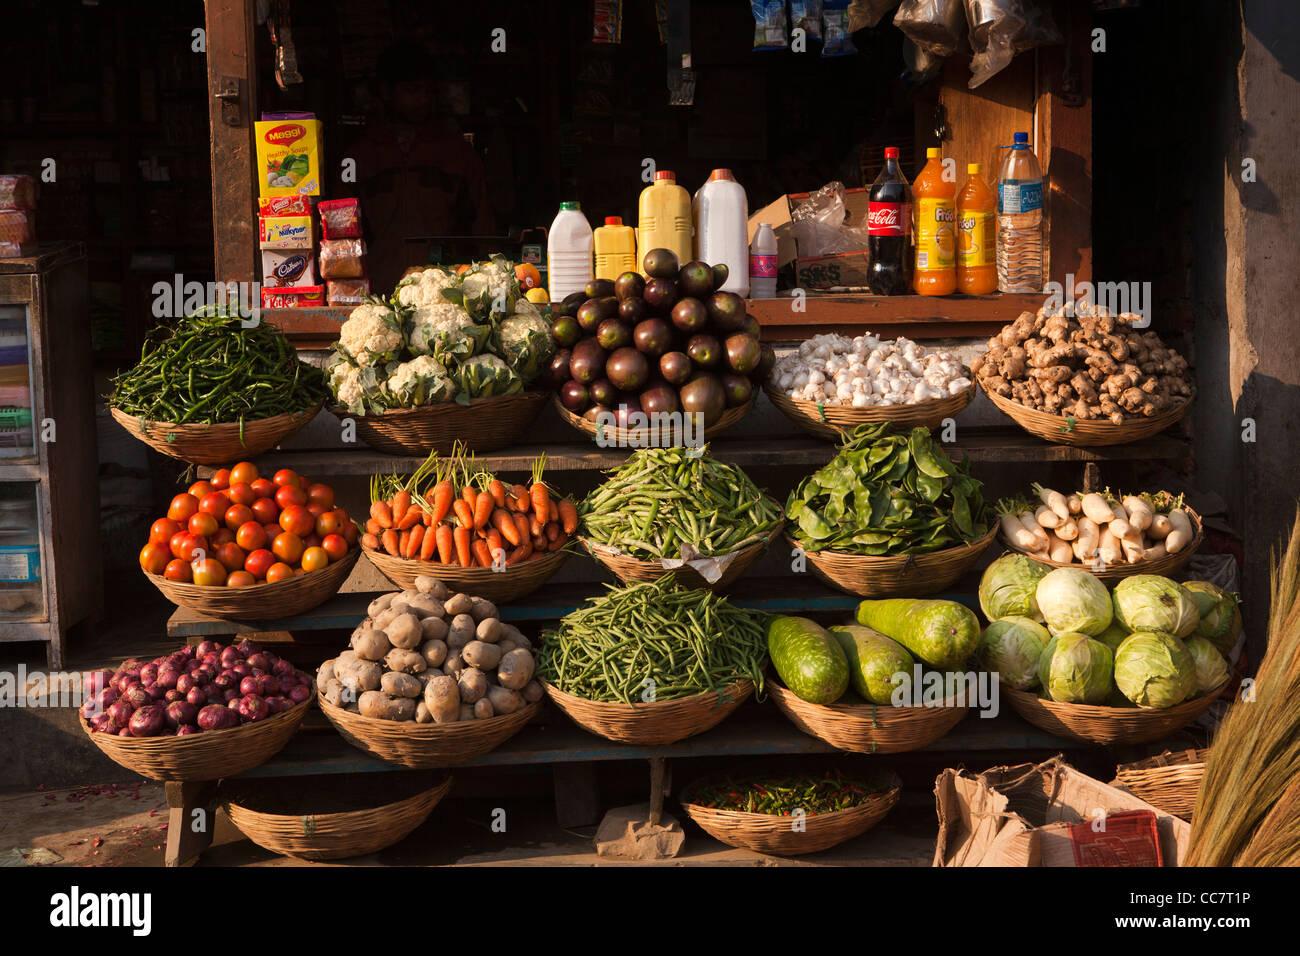 India arunachal pradesh dirang bazaar early morning for Arunachal pradesh cuisine